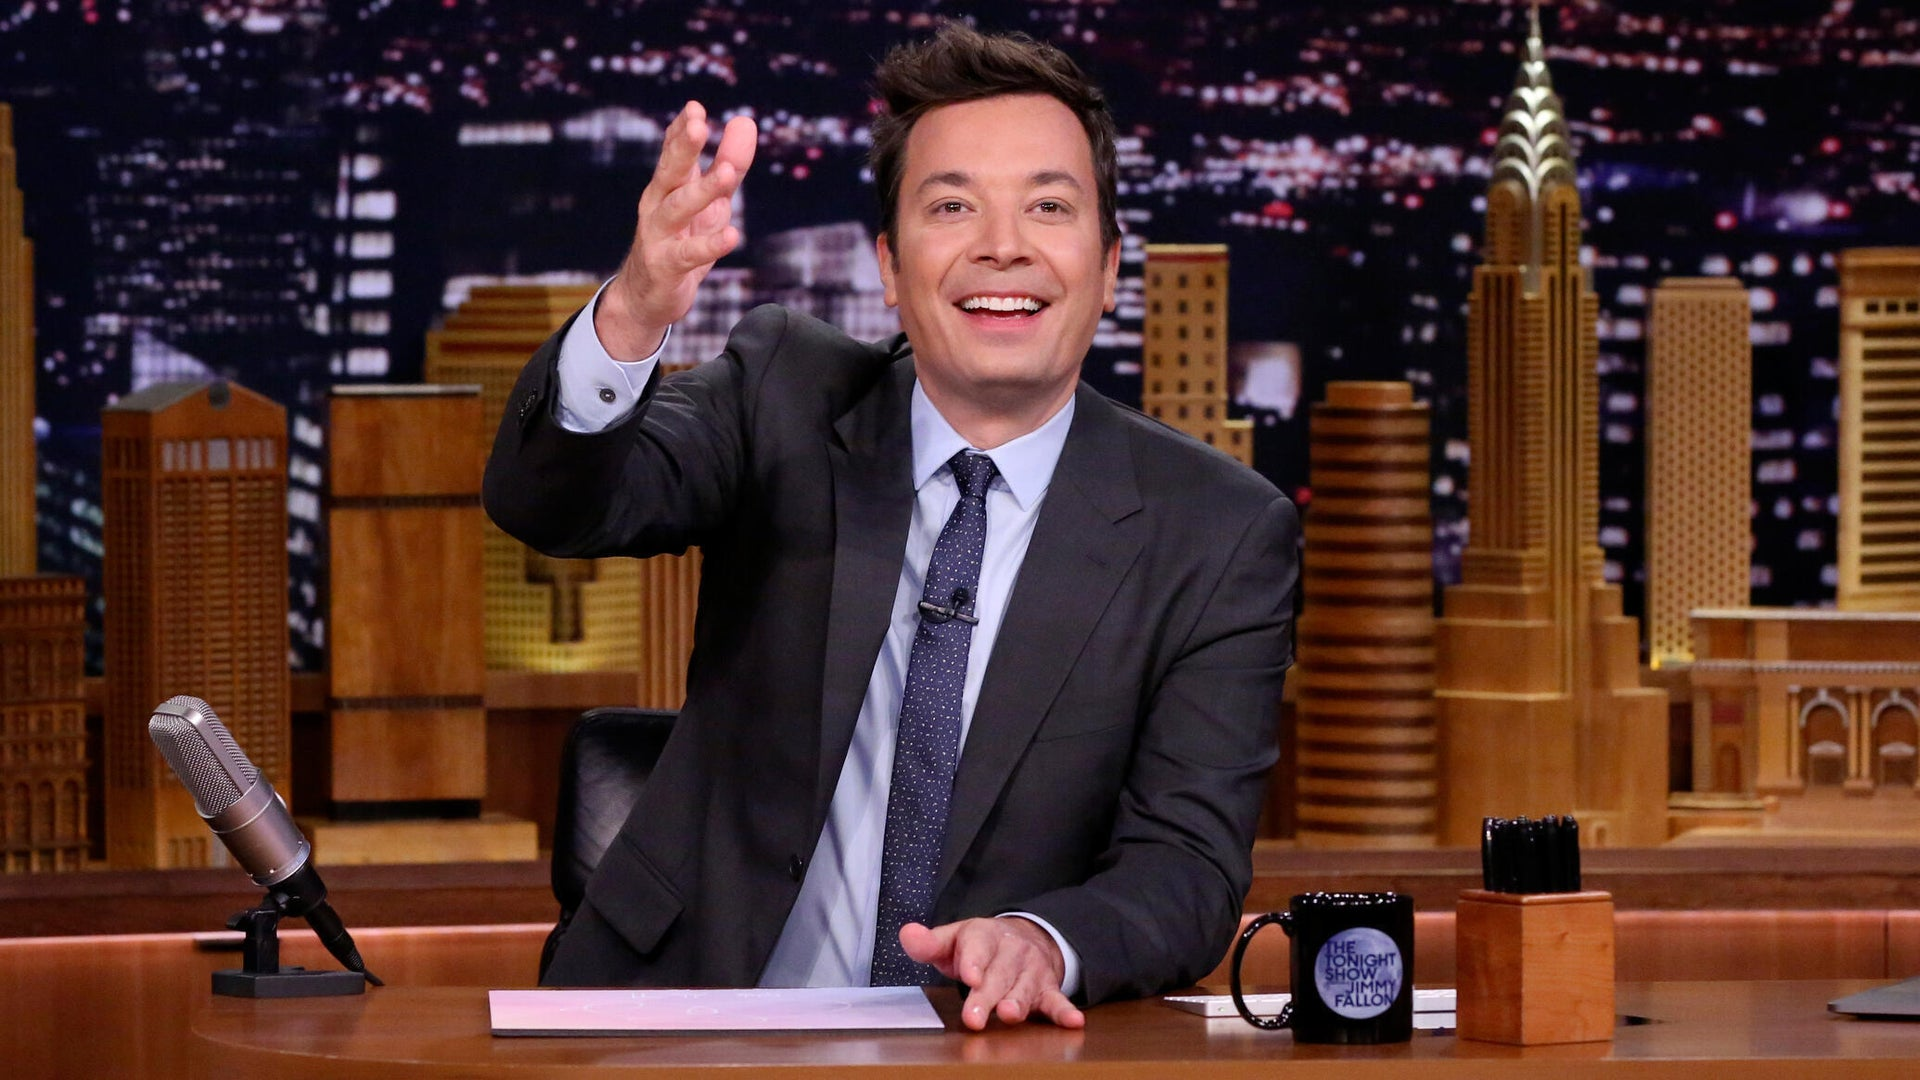 Jimmy Fallon, The Tonight Show with Jimmy Fallon